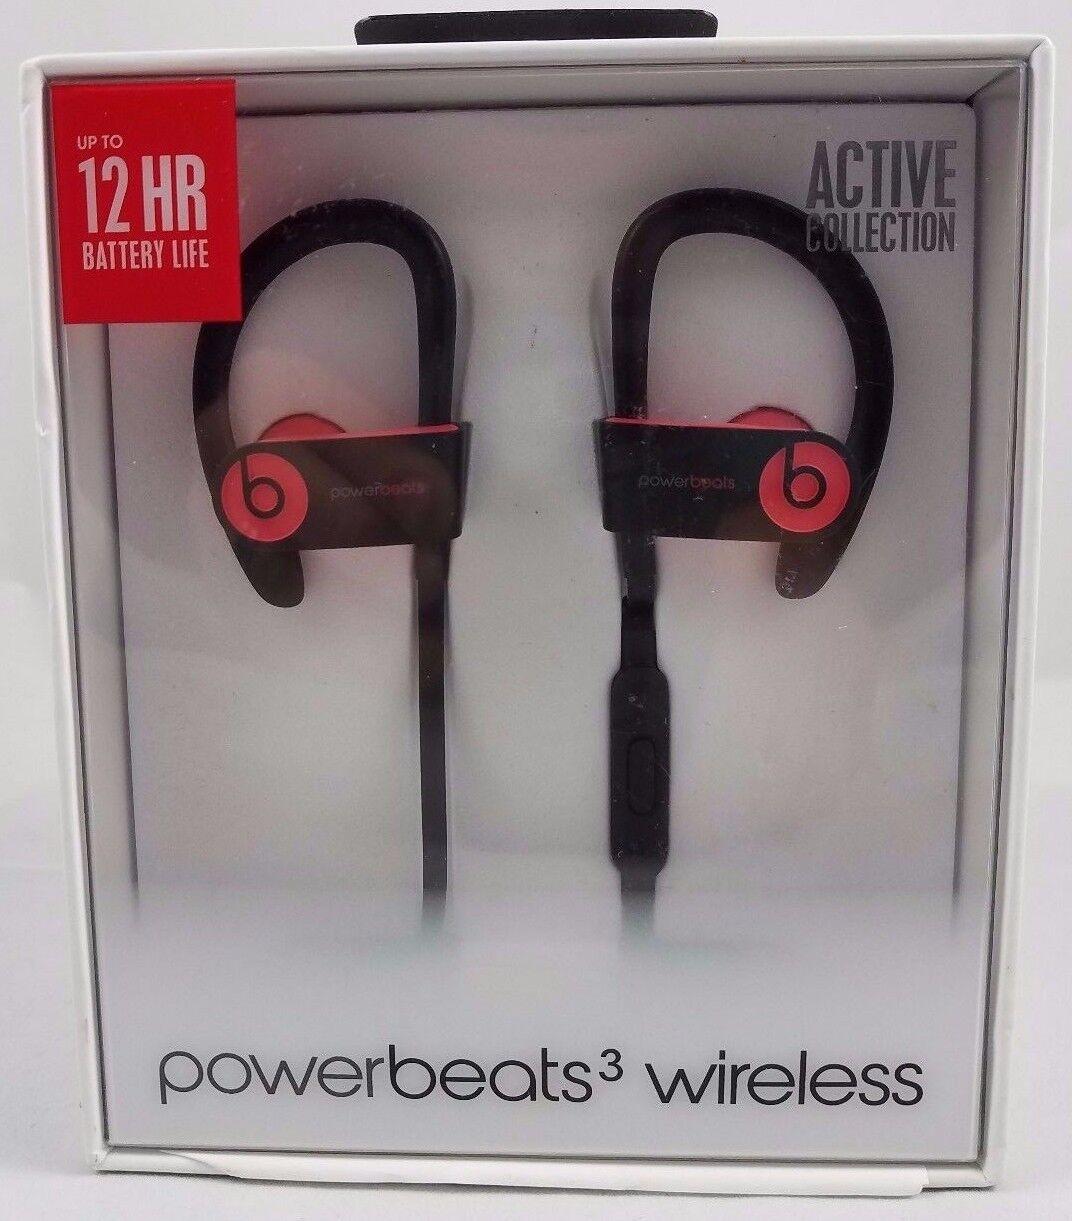 Authentic-Beats-by-Dr-Dre-Powerbeats3-Wireless-In-Ear-Headphones